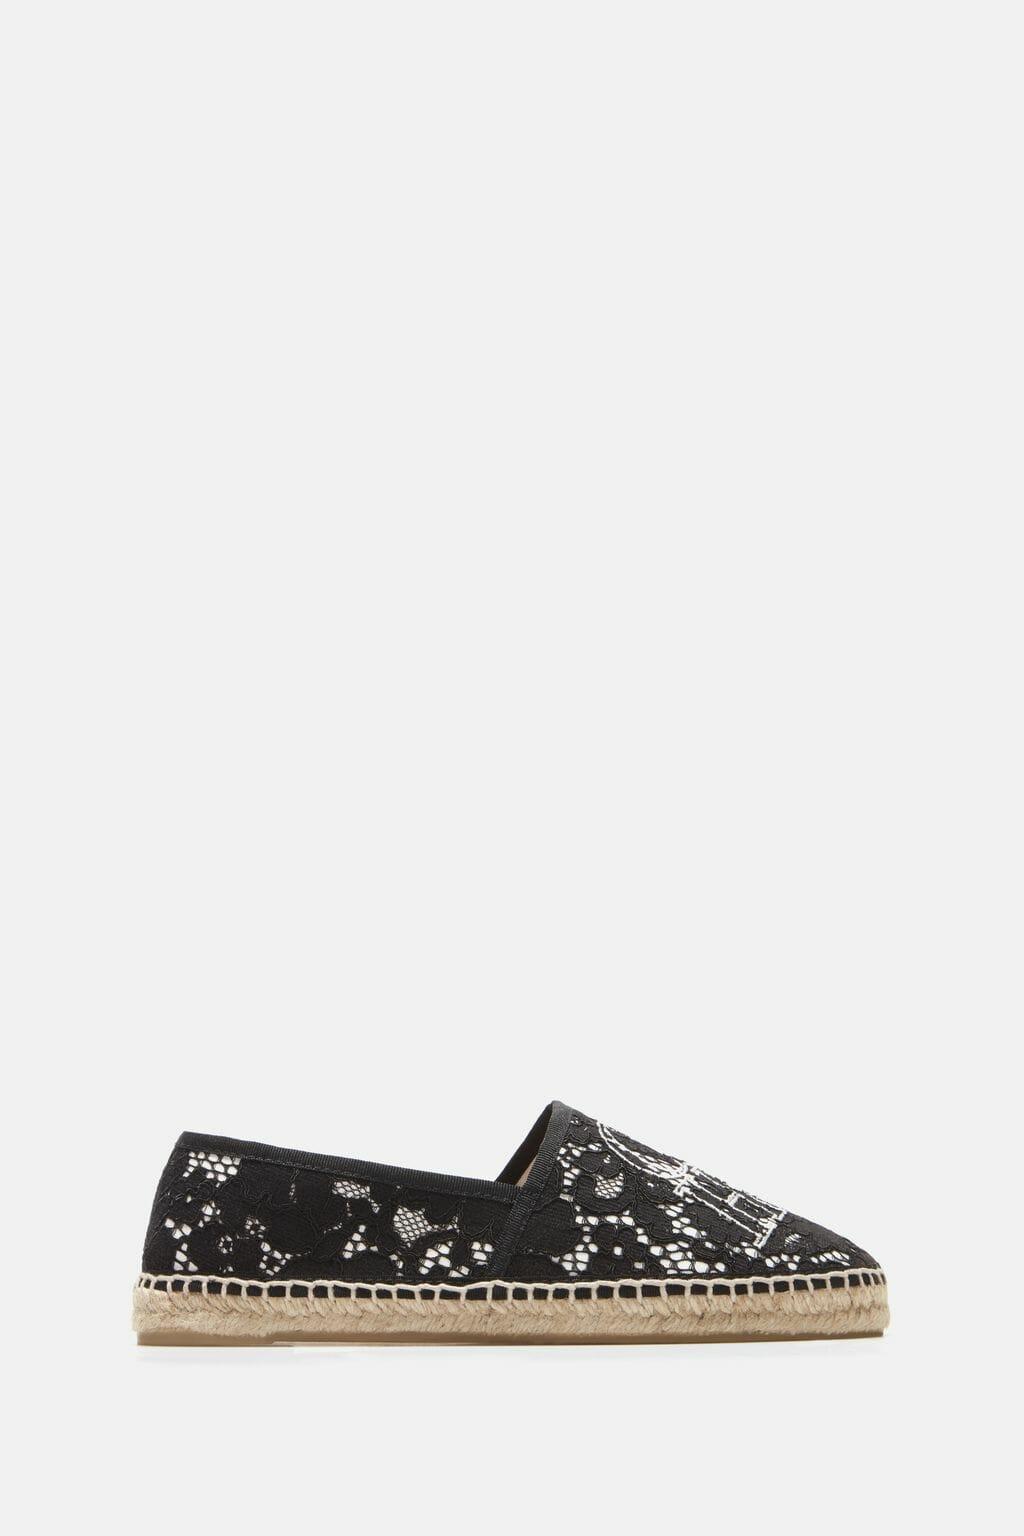 CH-Carolina-herrera-shoes-collection-Spring-Summer-2018-shoe-30